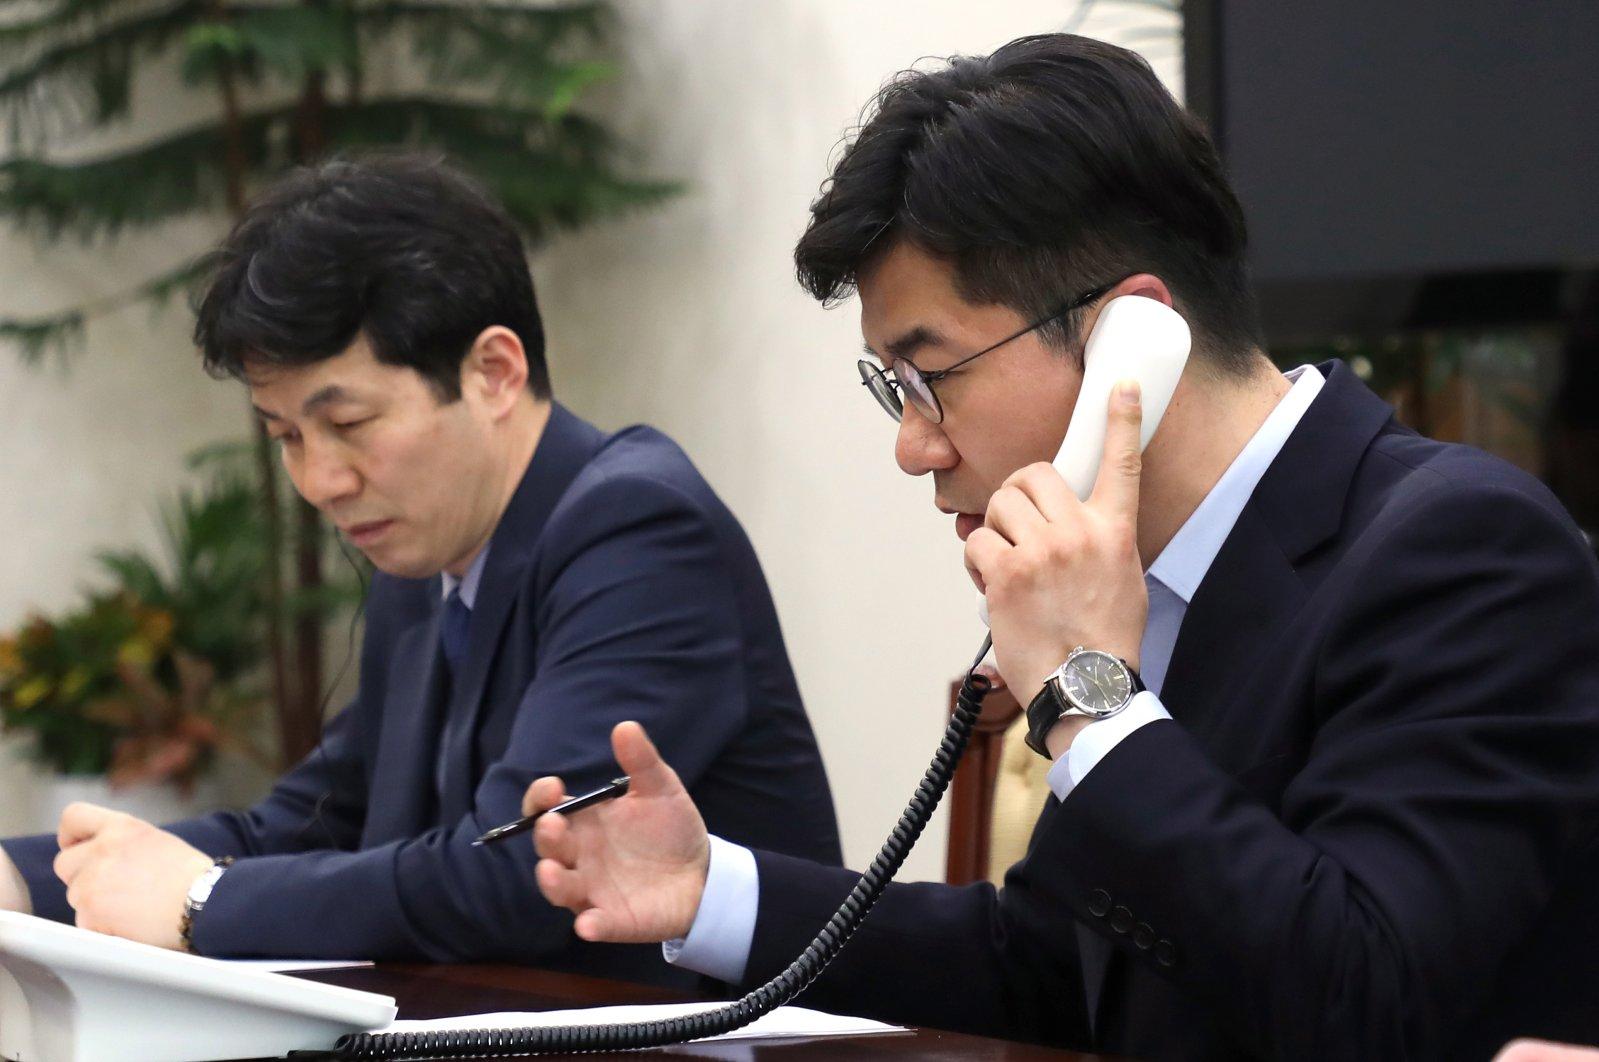 South Korean presidential officials make a test call to North Korea via a hotline between the leaders of the two Koreas at the presidential office in Seoul, South Korea, April 20, 2018. (EPA Photo)